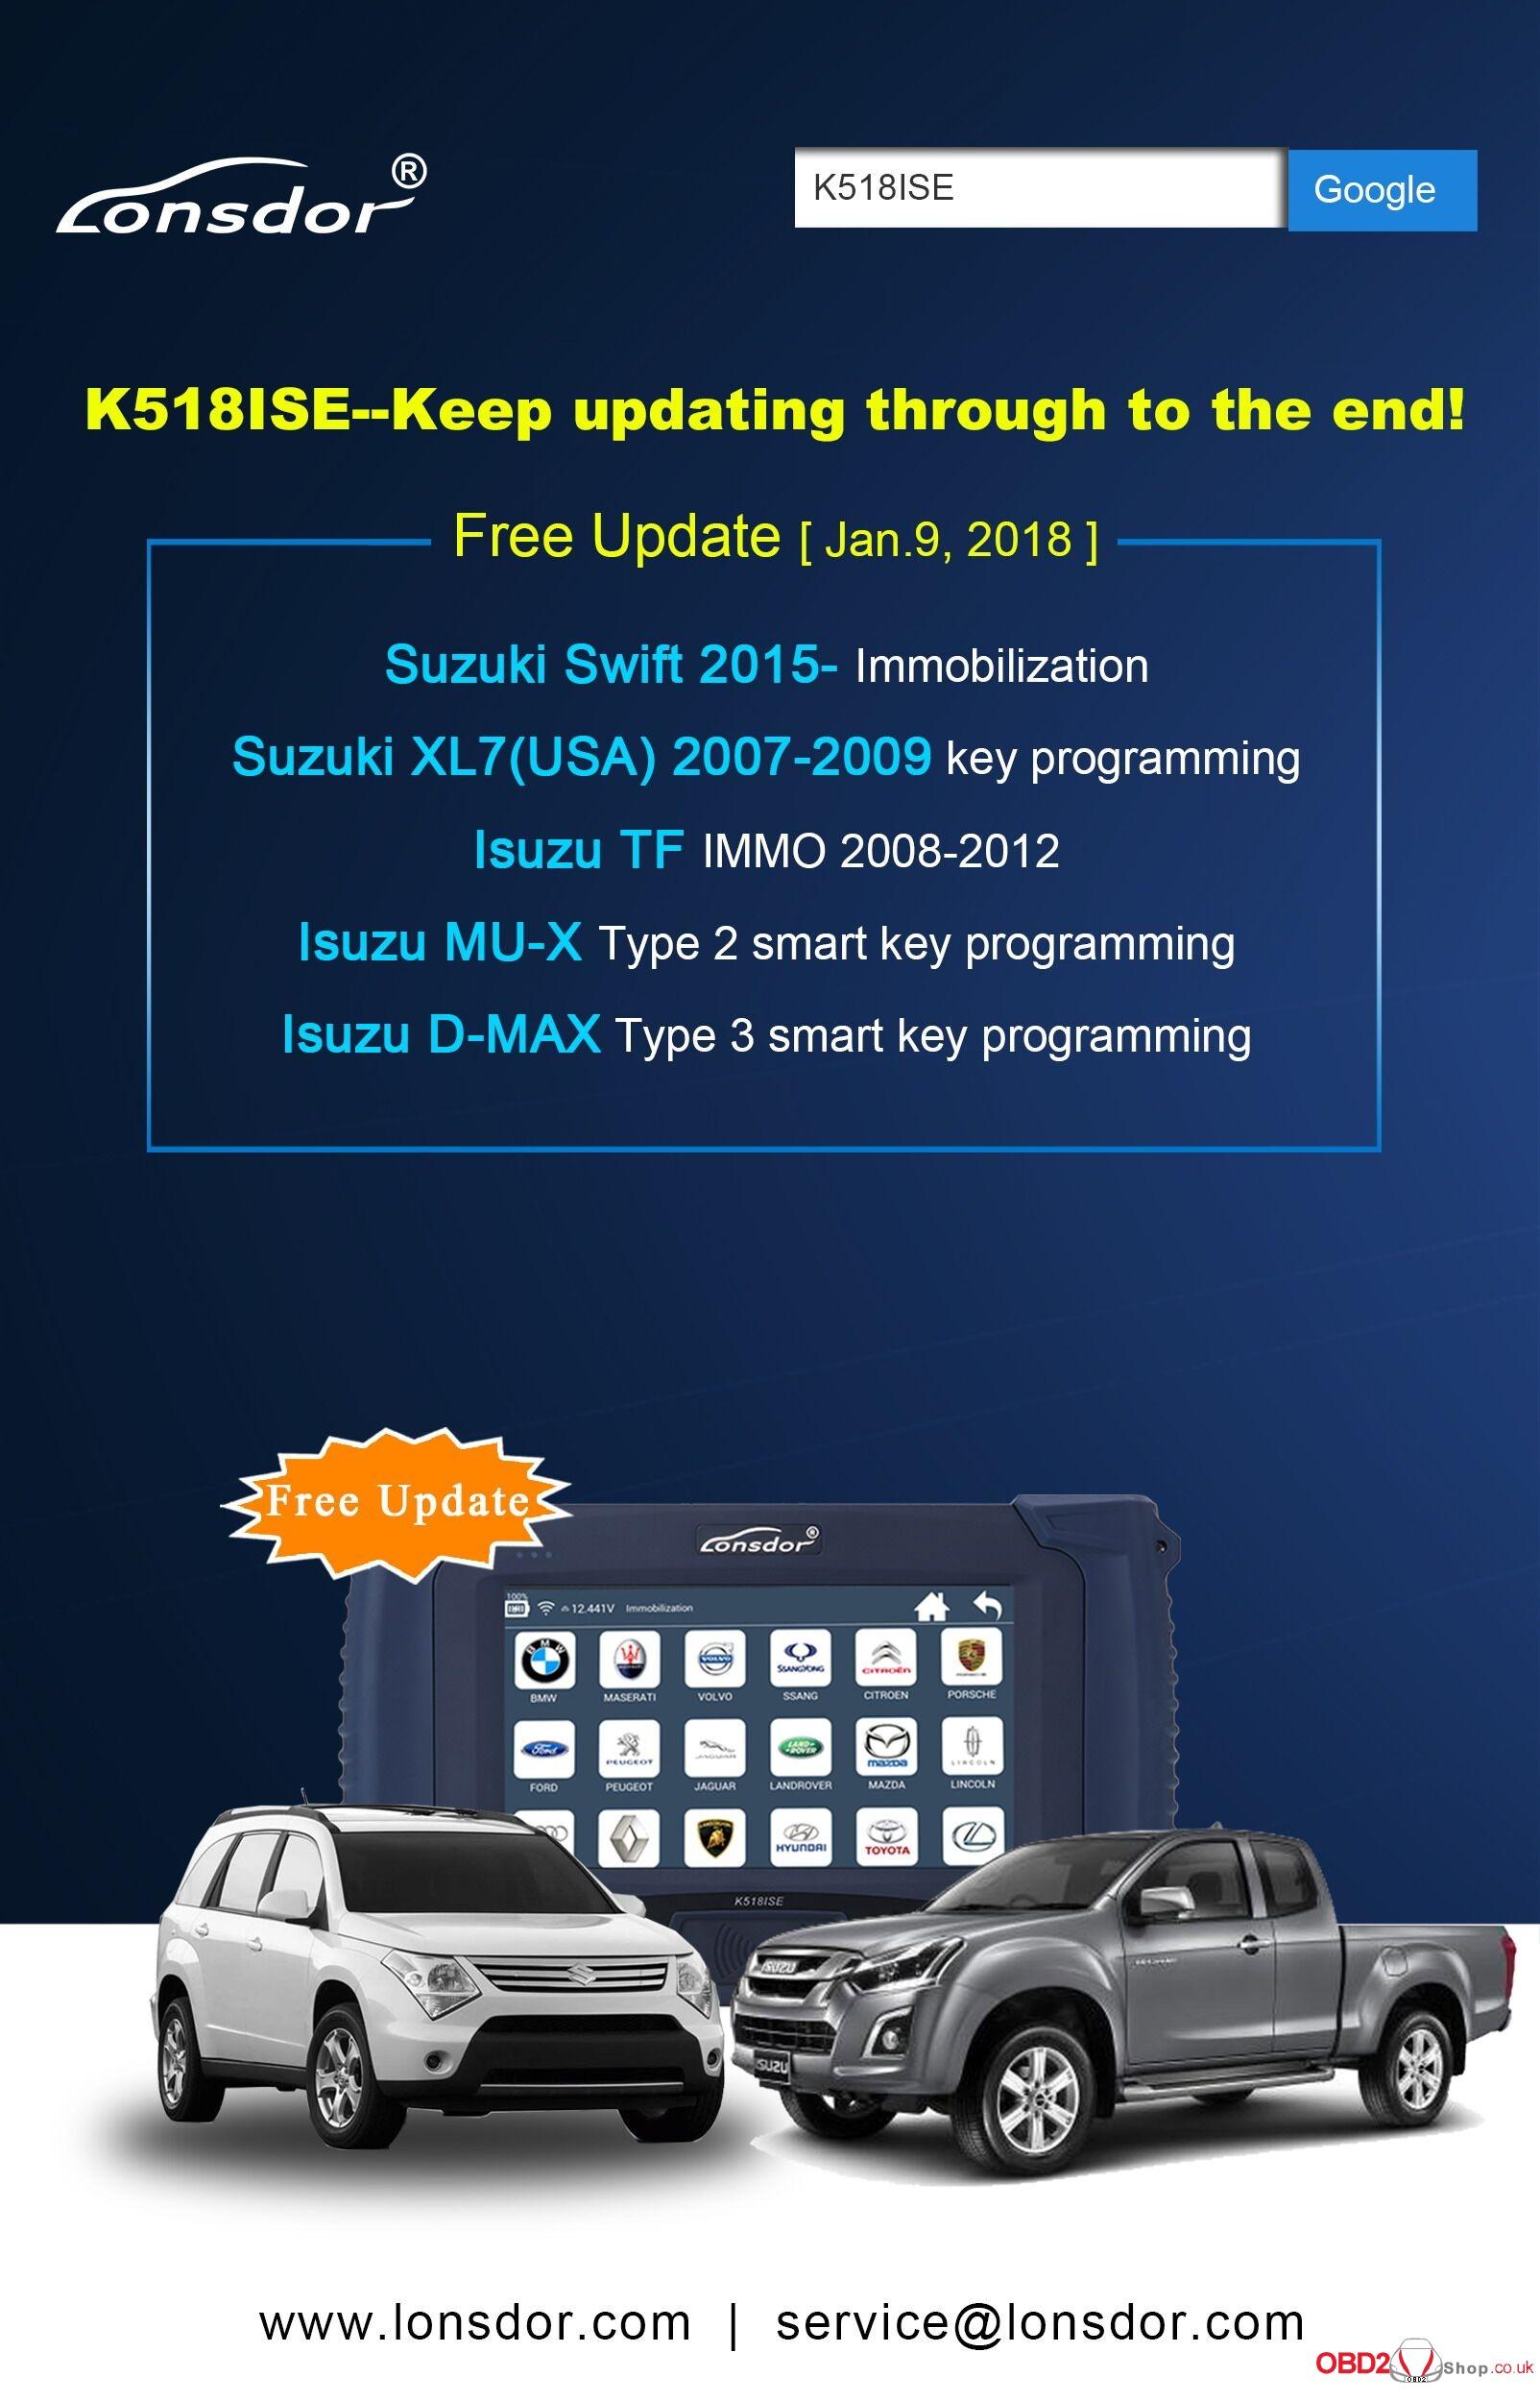 lonsdor k518ise free update